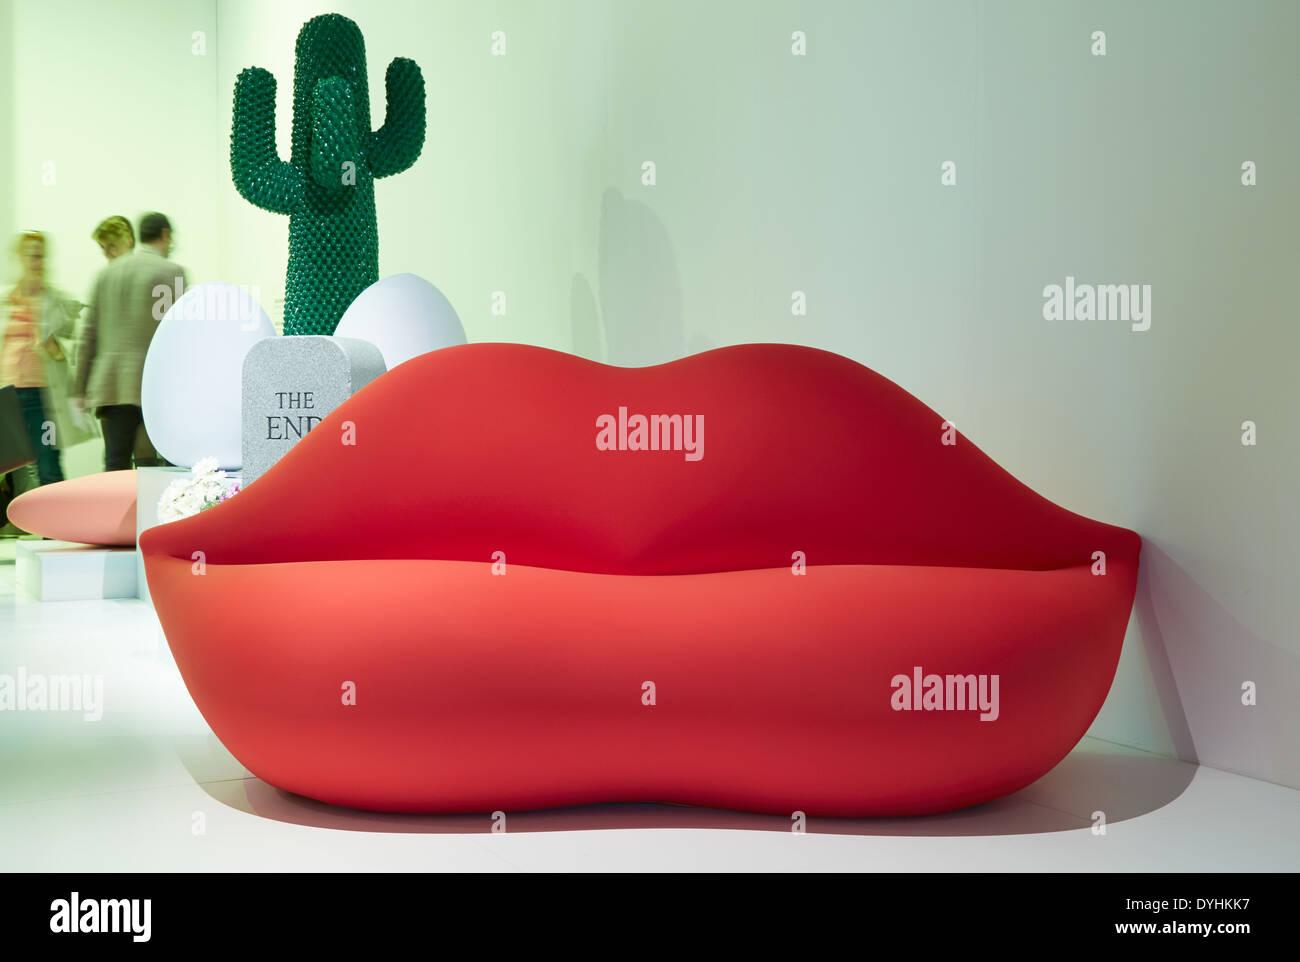 Gufram Bocca Sofa At The Stand During Salone Internazionale Del Mobile In  Milan